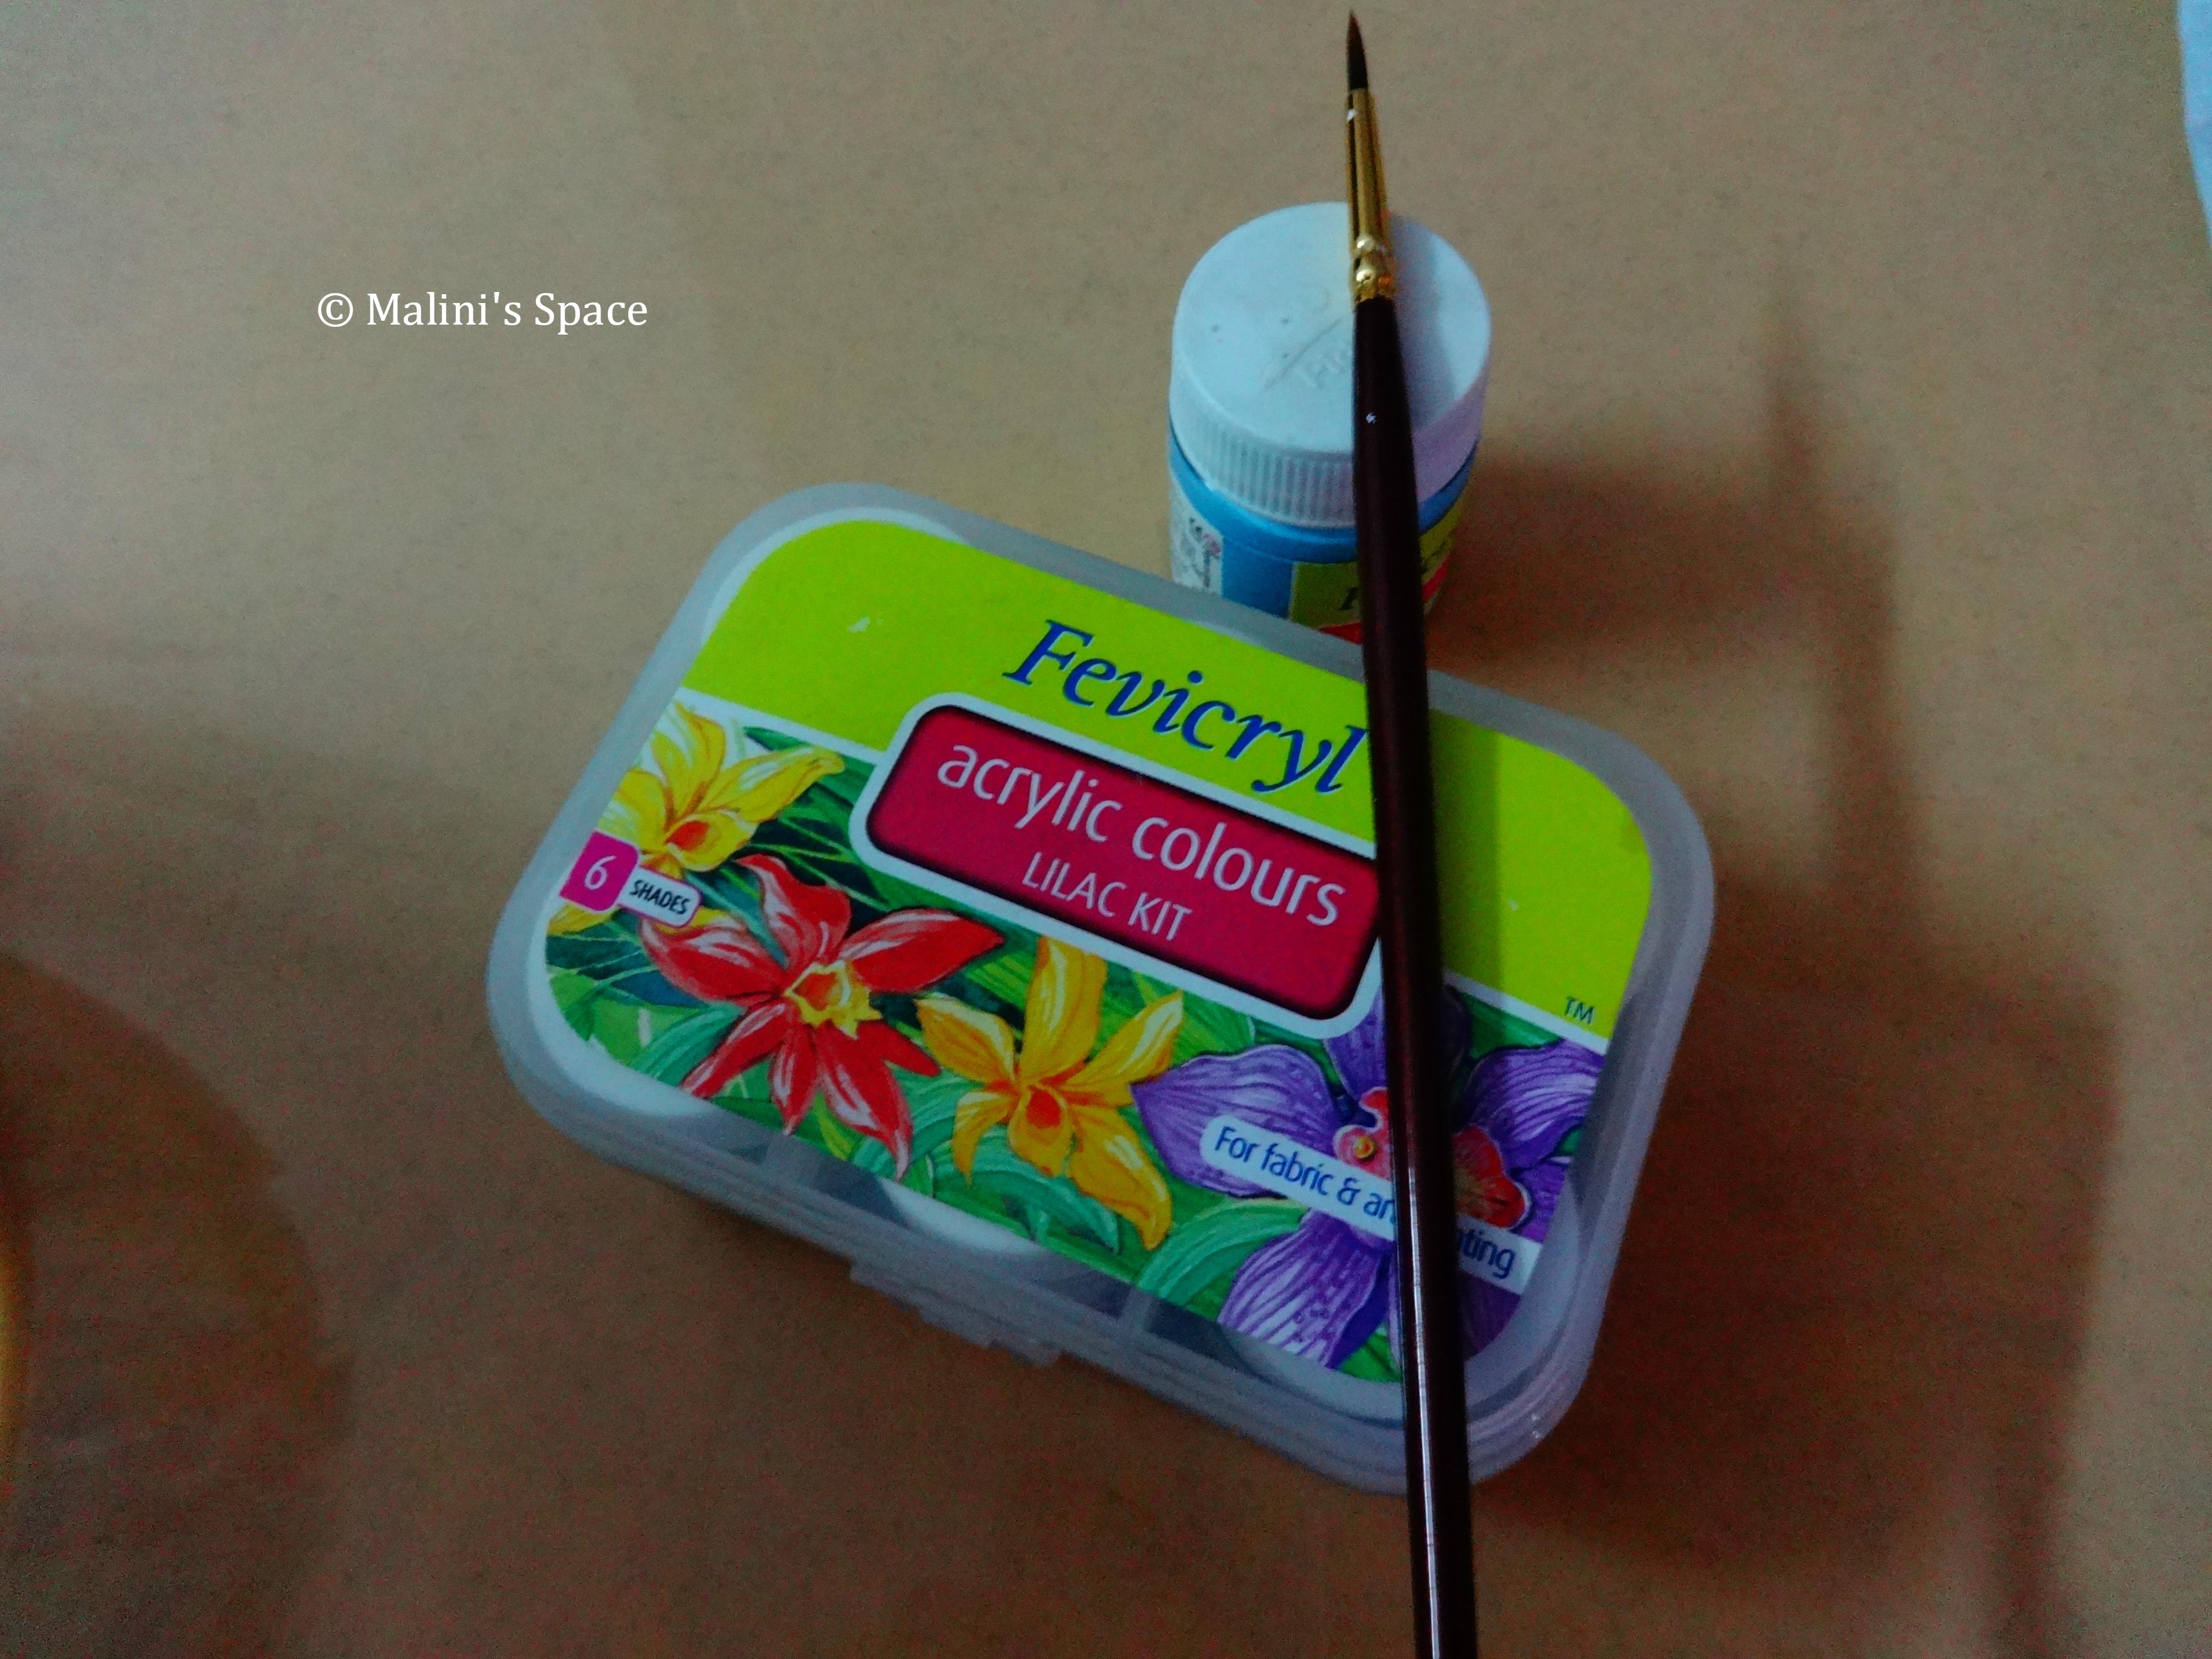 Fevicryl (Acrylic Colours)